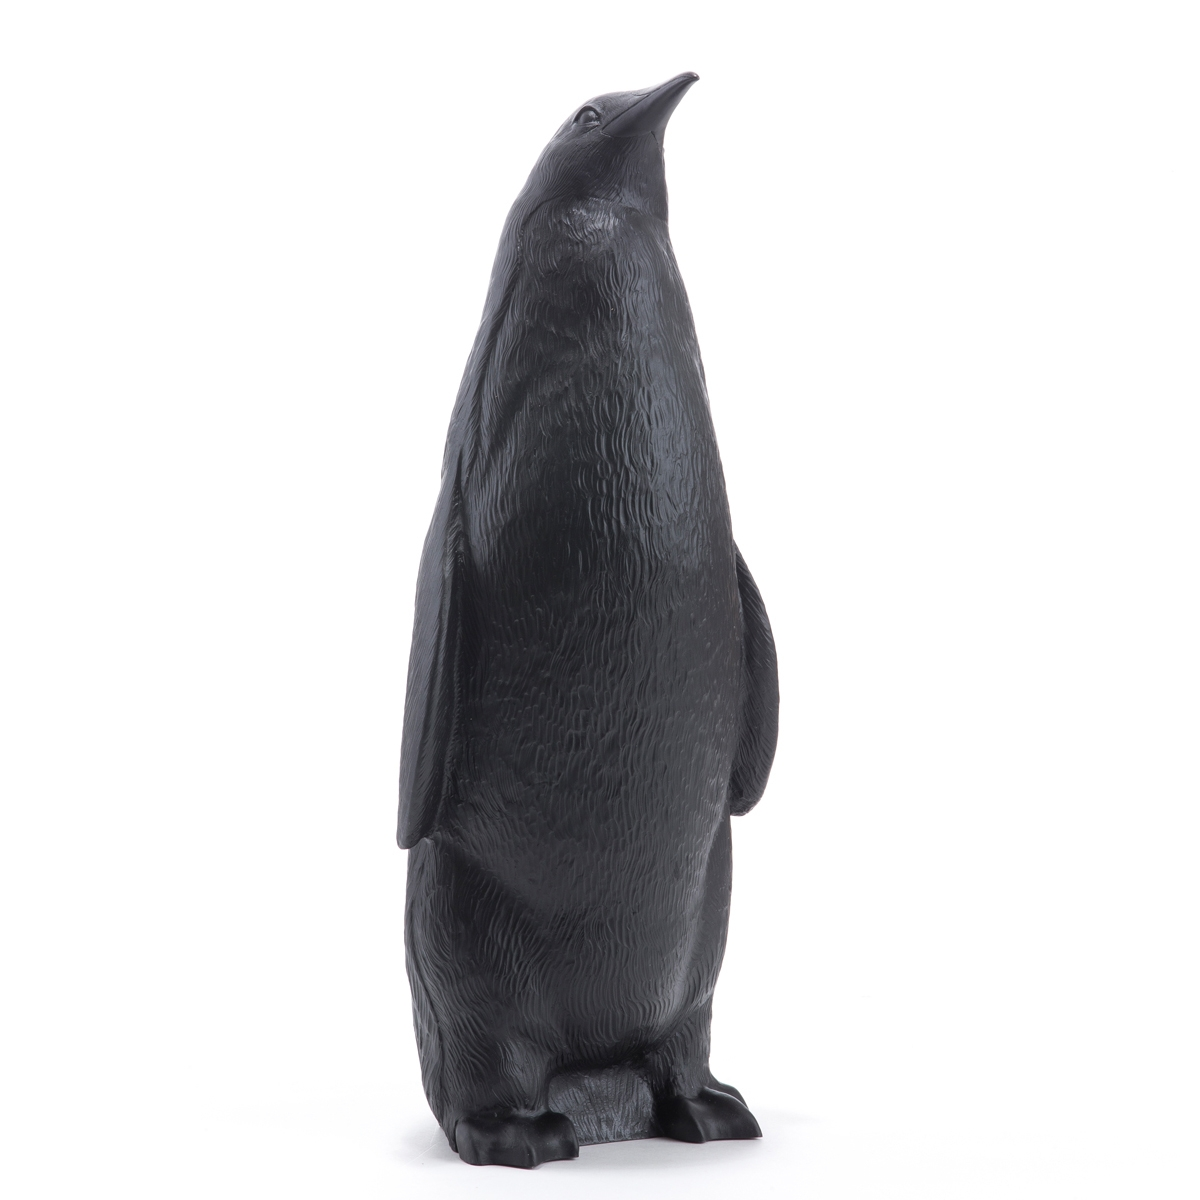 Le Pingouin Tête Haute, Head down